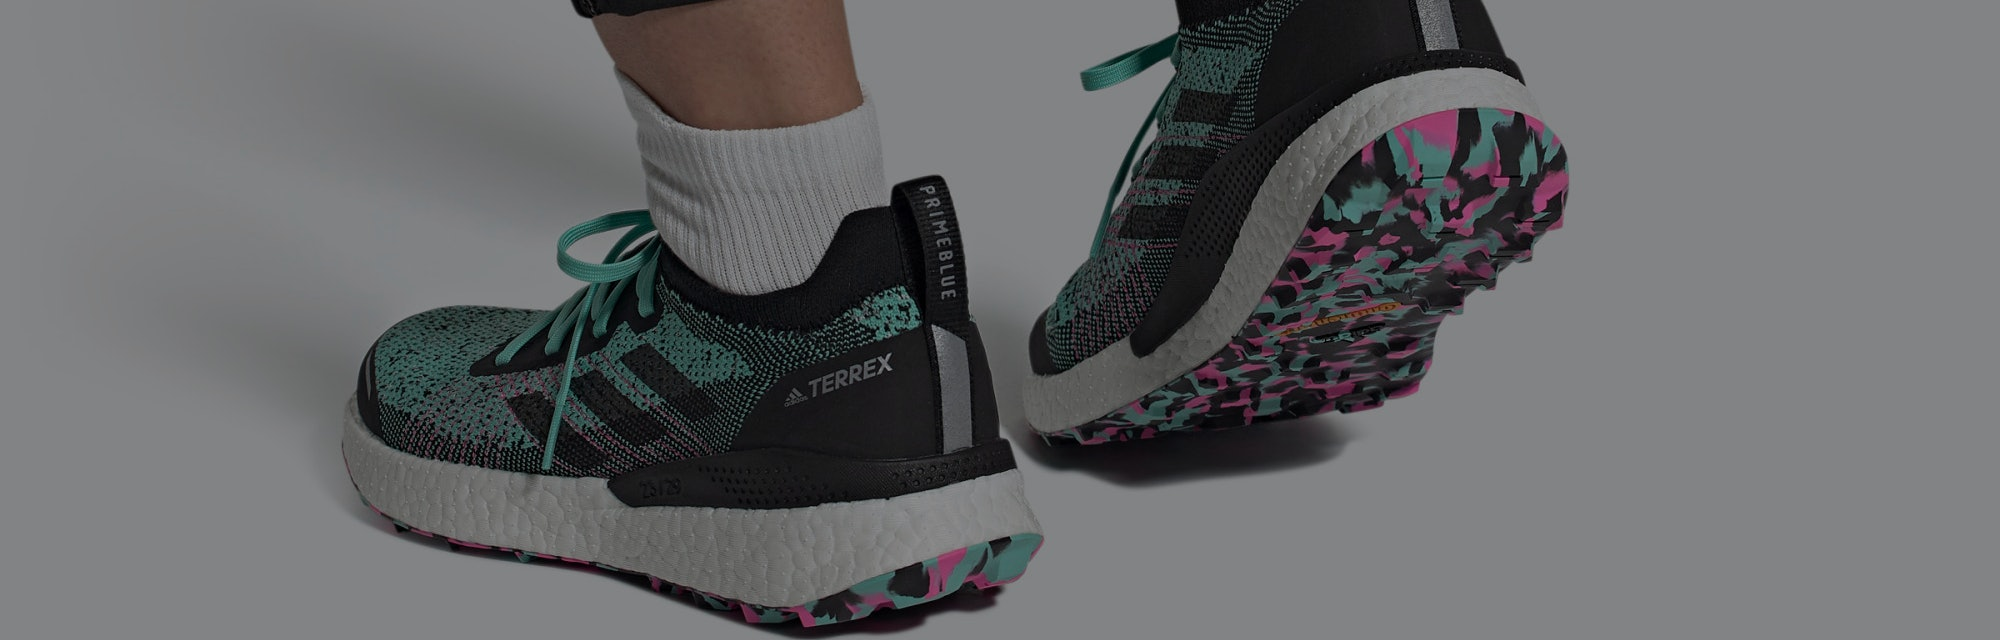 Adidas Terrex Two Ultra Primeblue